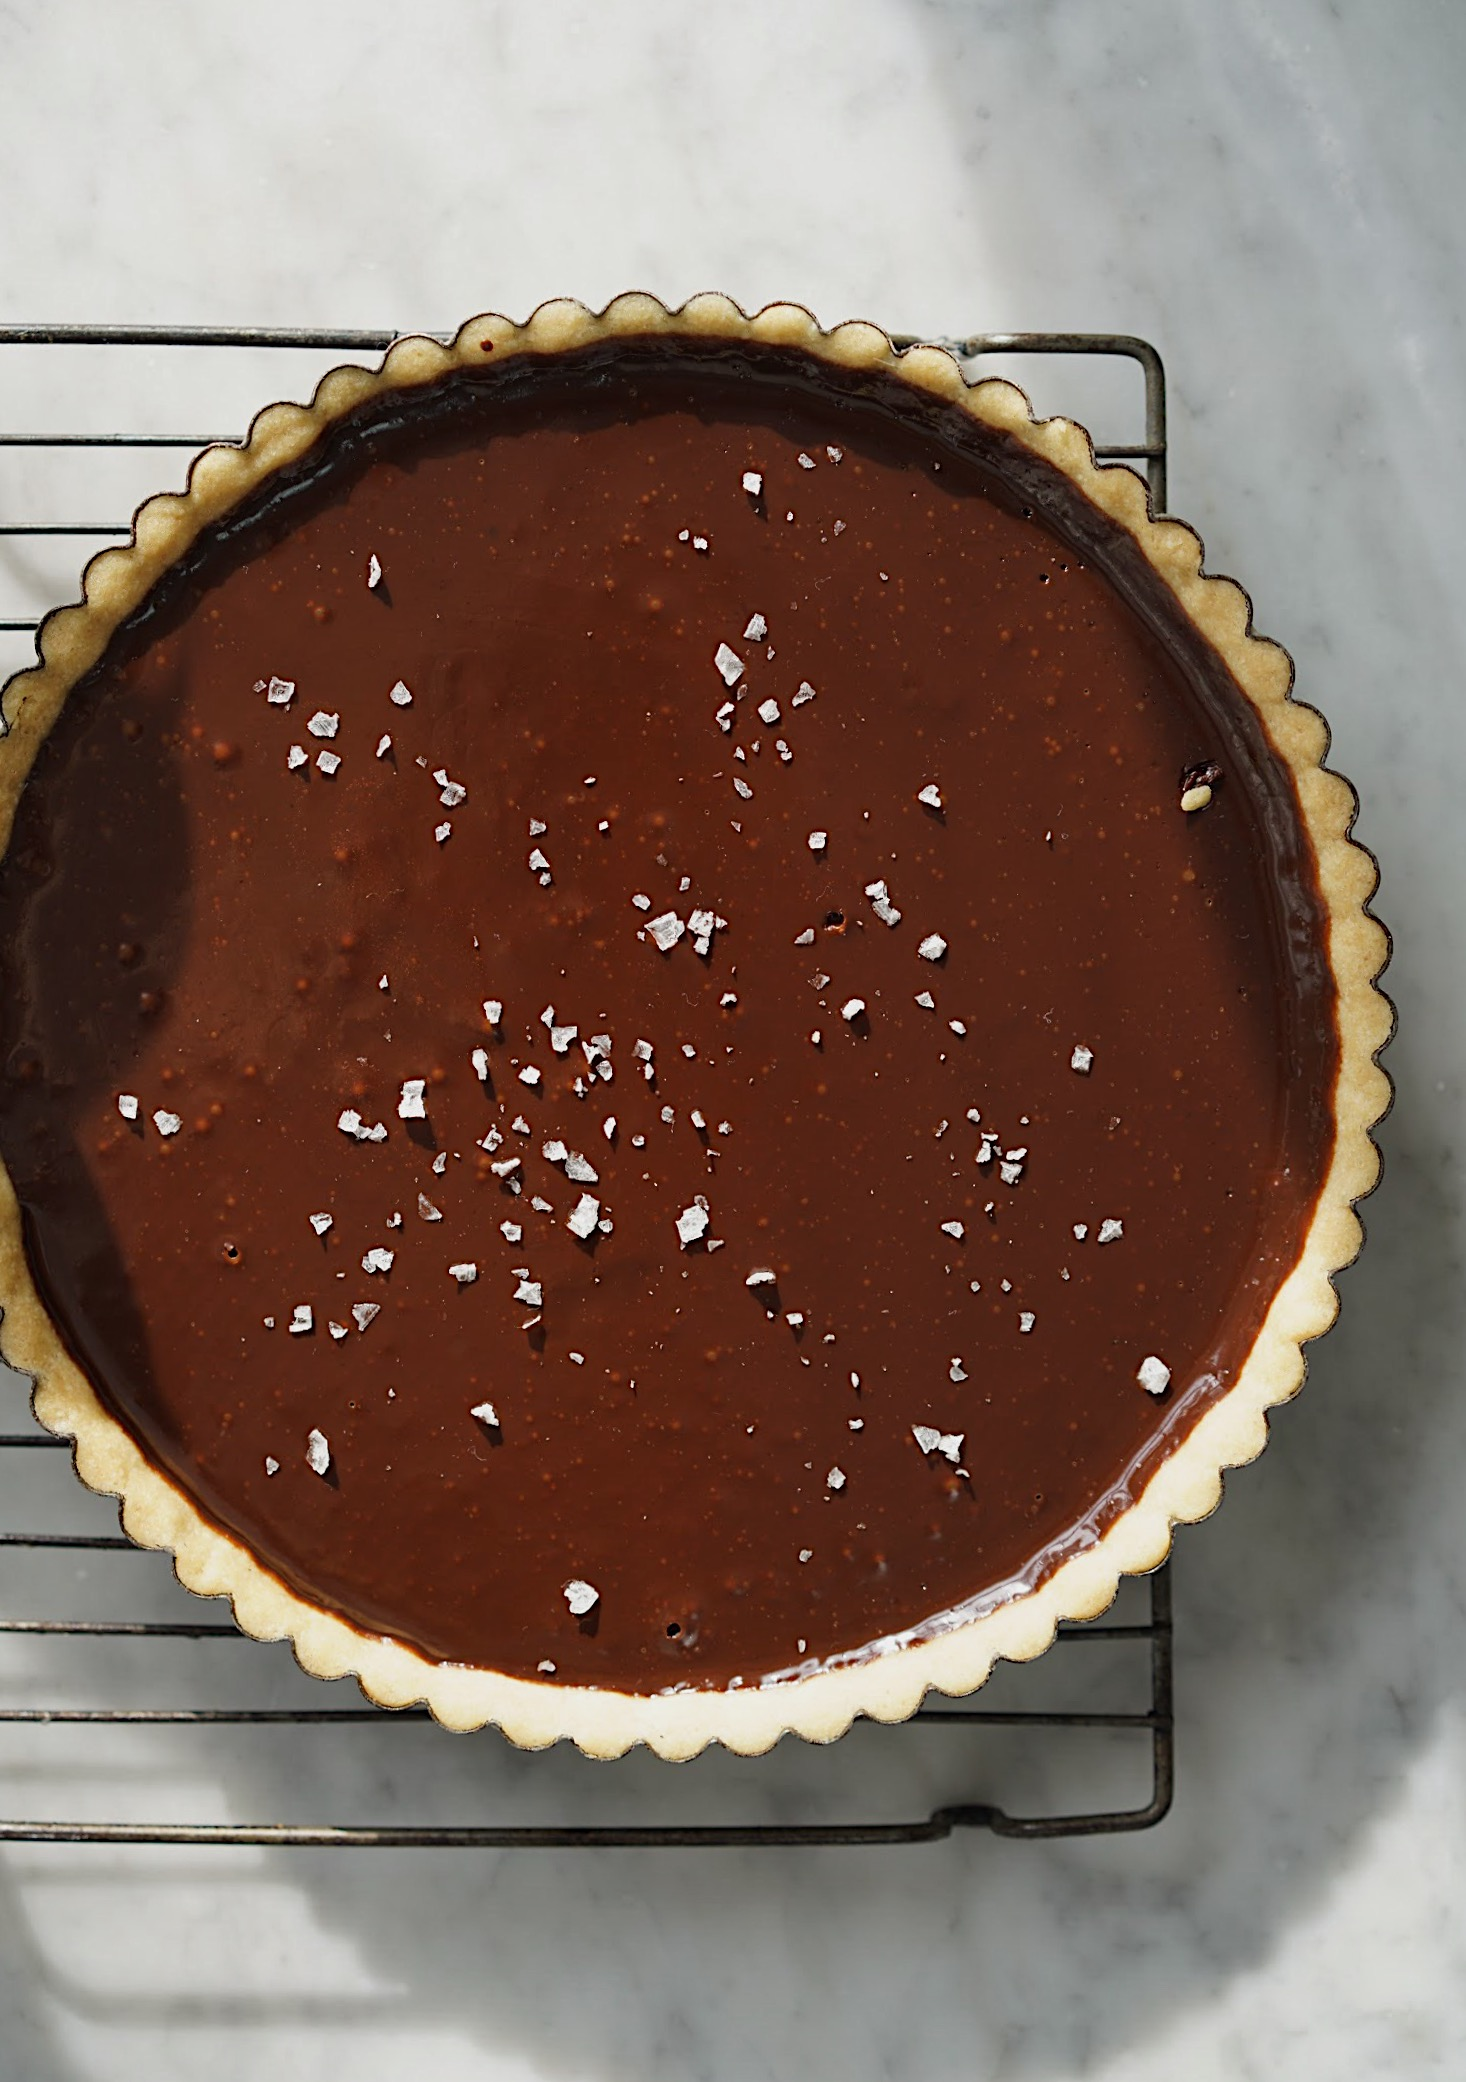 COPELAND_BITTERSWEET_CHOCOLATE_TRUFFLE_TART_SEA_SALTF7F63.JPGBITTERSWEET CHOCOLATE TART WITH SEA SALT  by Sarah Copeland #chocolate #bittersweetchocolate #chocolaterecipes #chocolatetruffle #sarahcopeland #edibleliving